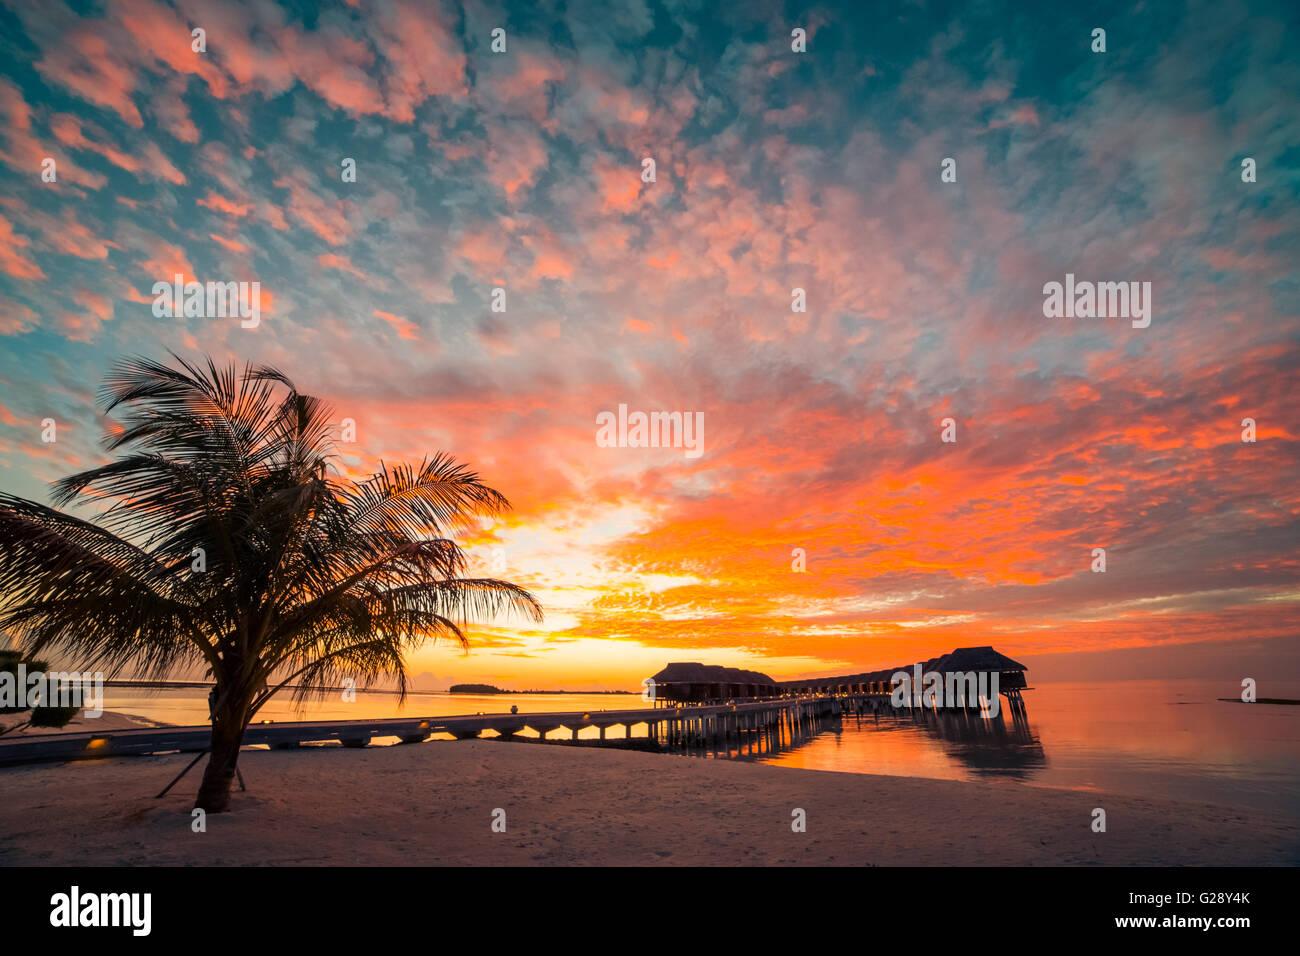 Amazing sunset beach in Maldives. Background concept - Stock Image